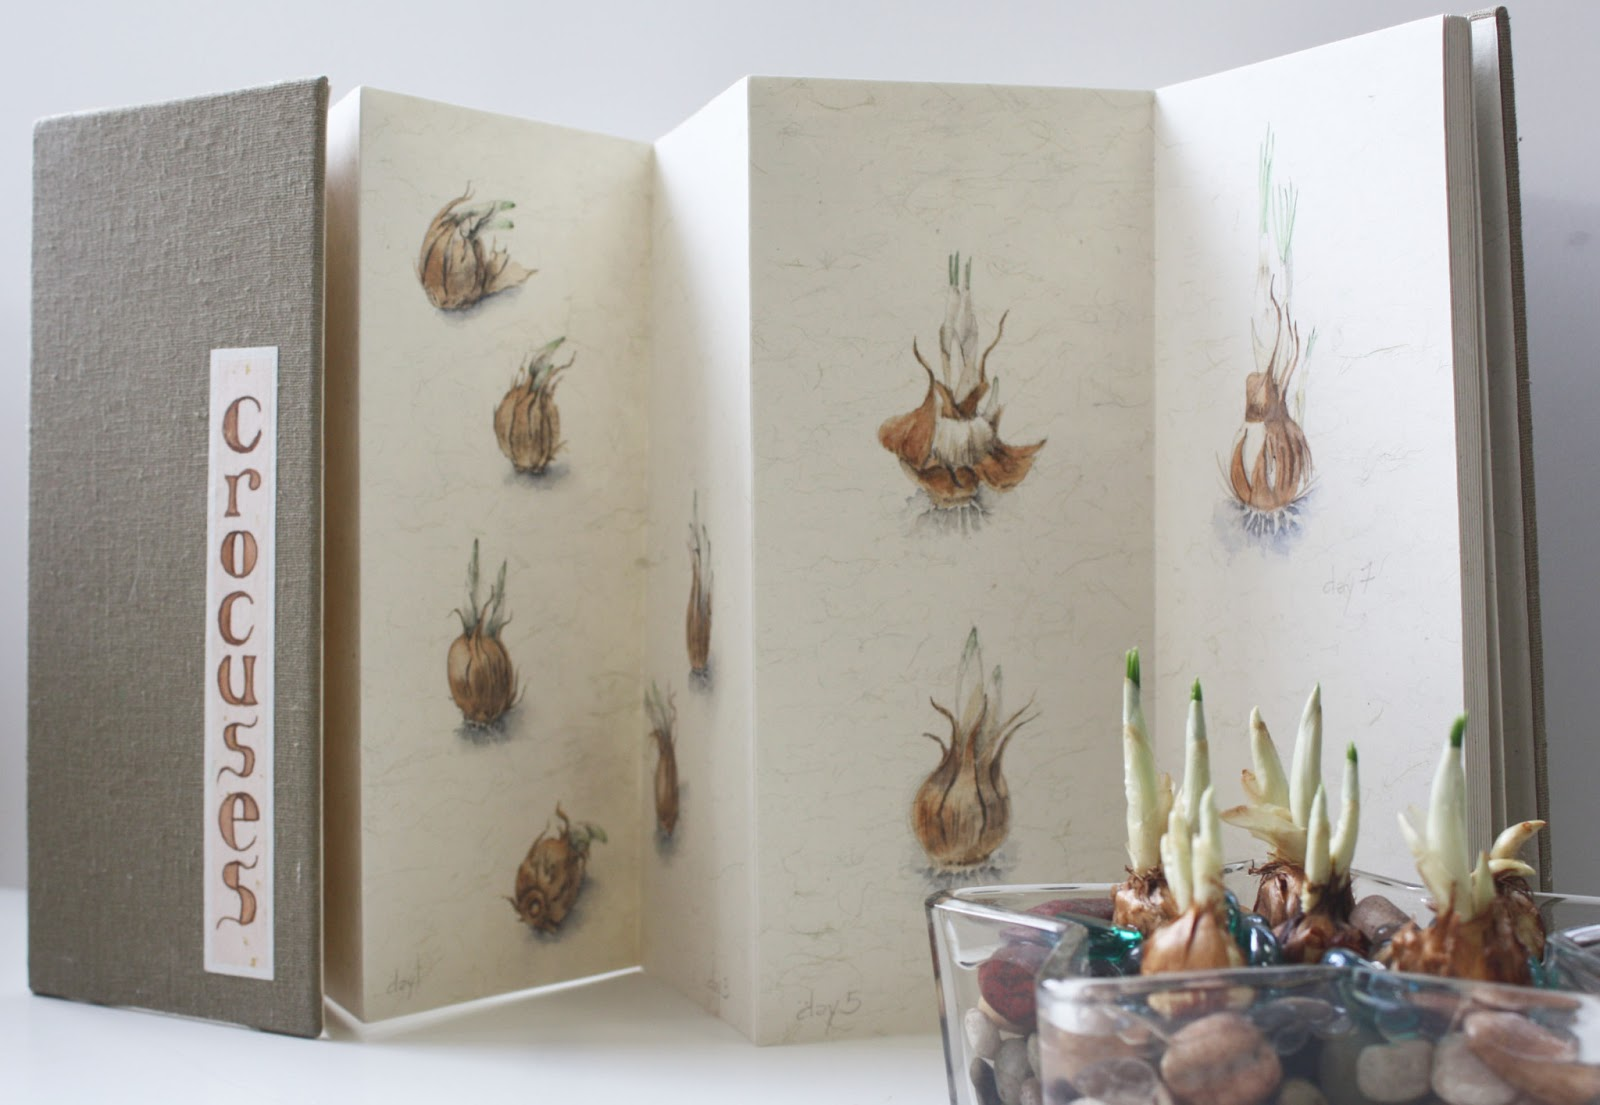 Carsley Studio Artists Blog Mid Winter Project For Botanical Art